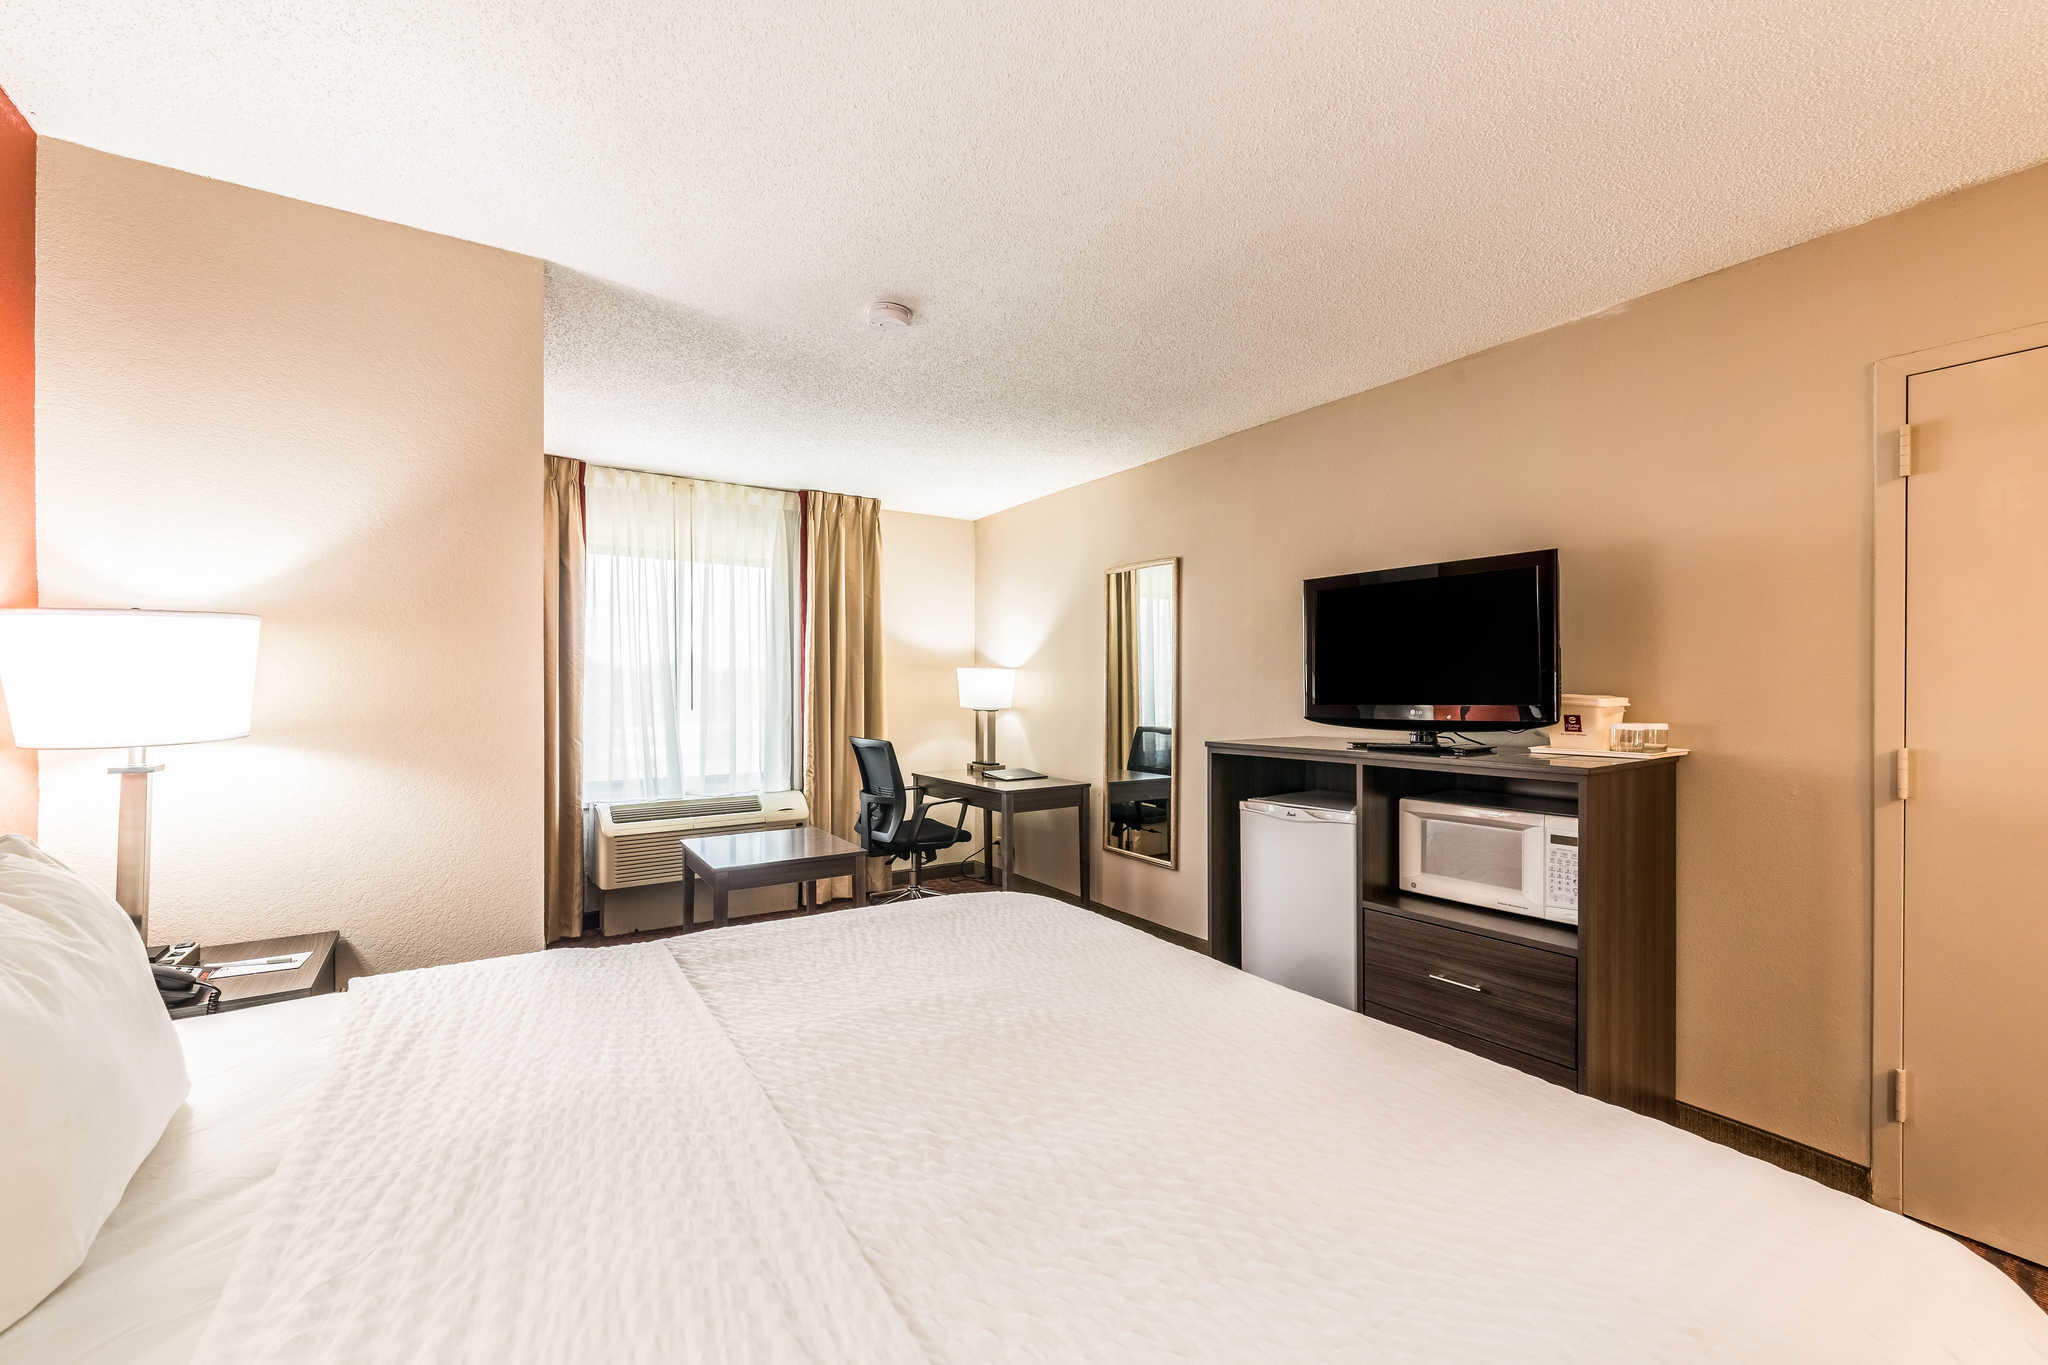 Clarion Inn & Suites image 20